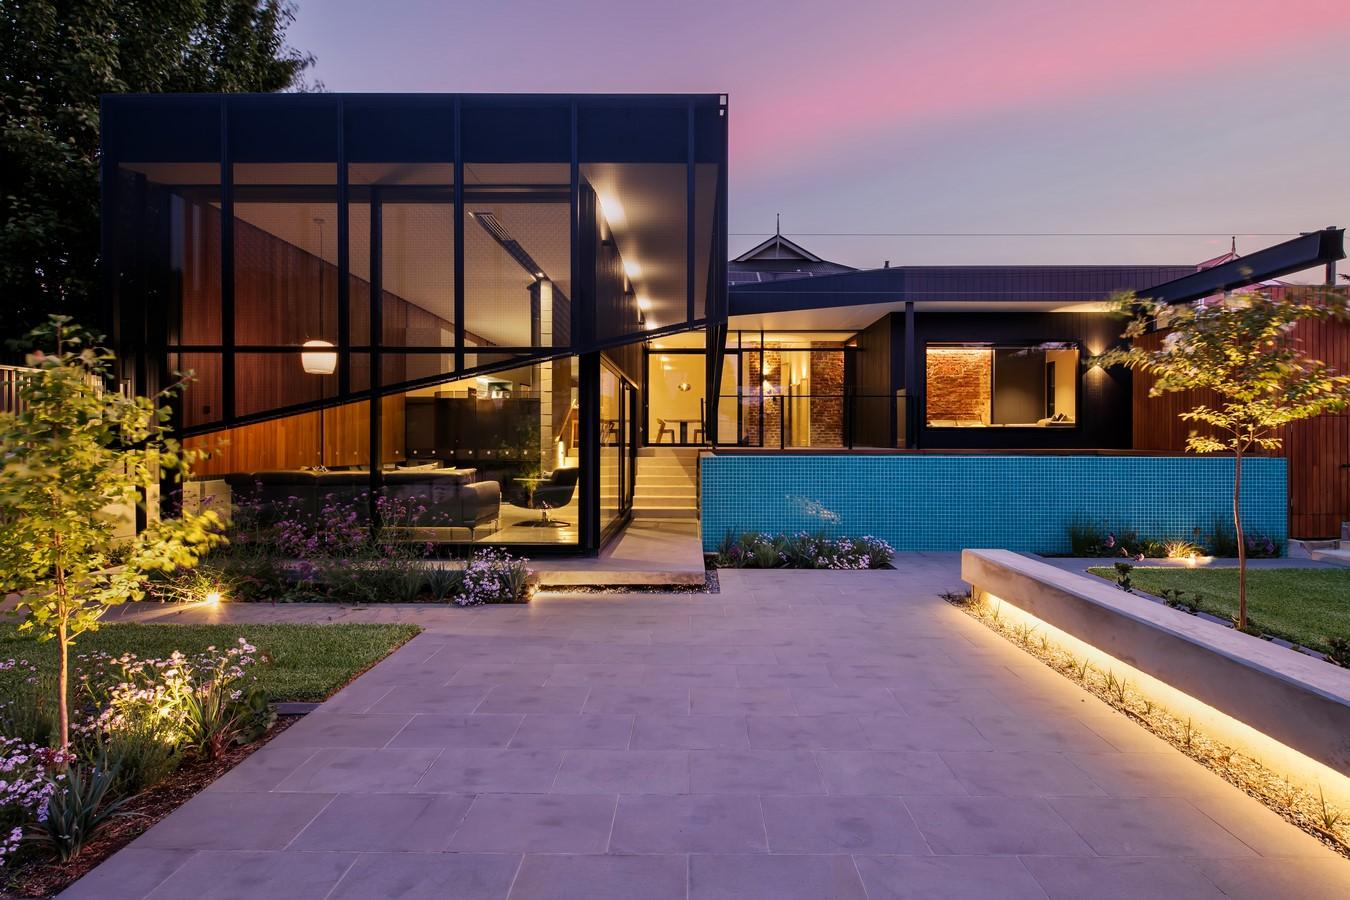 Veil Mortar By Khab Architects - Sheet2